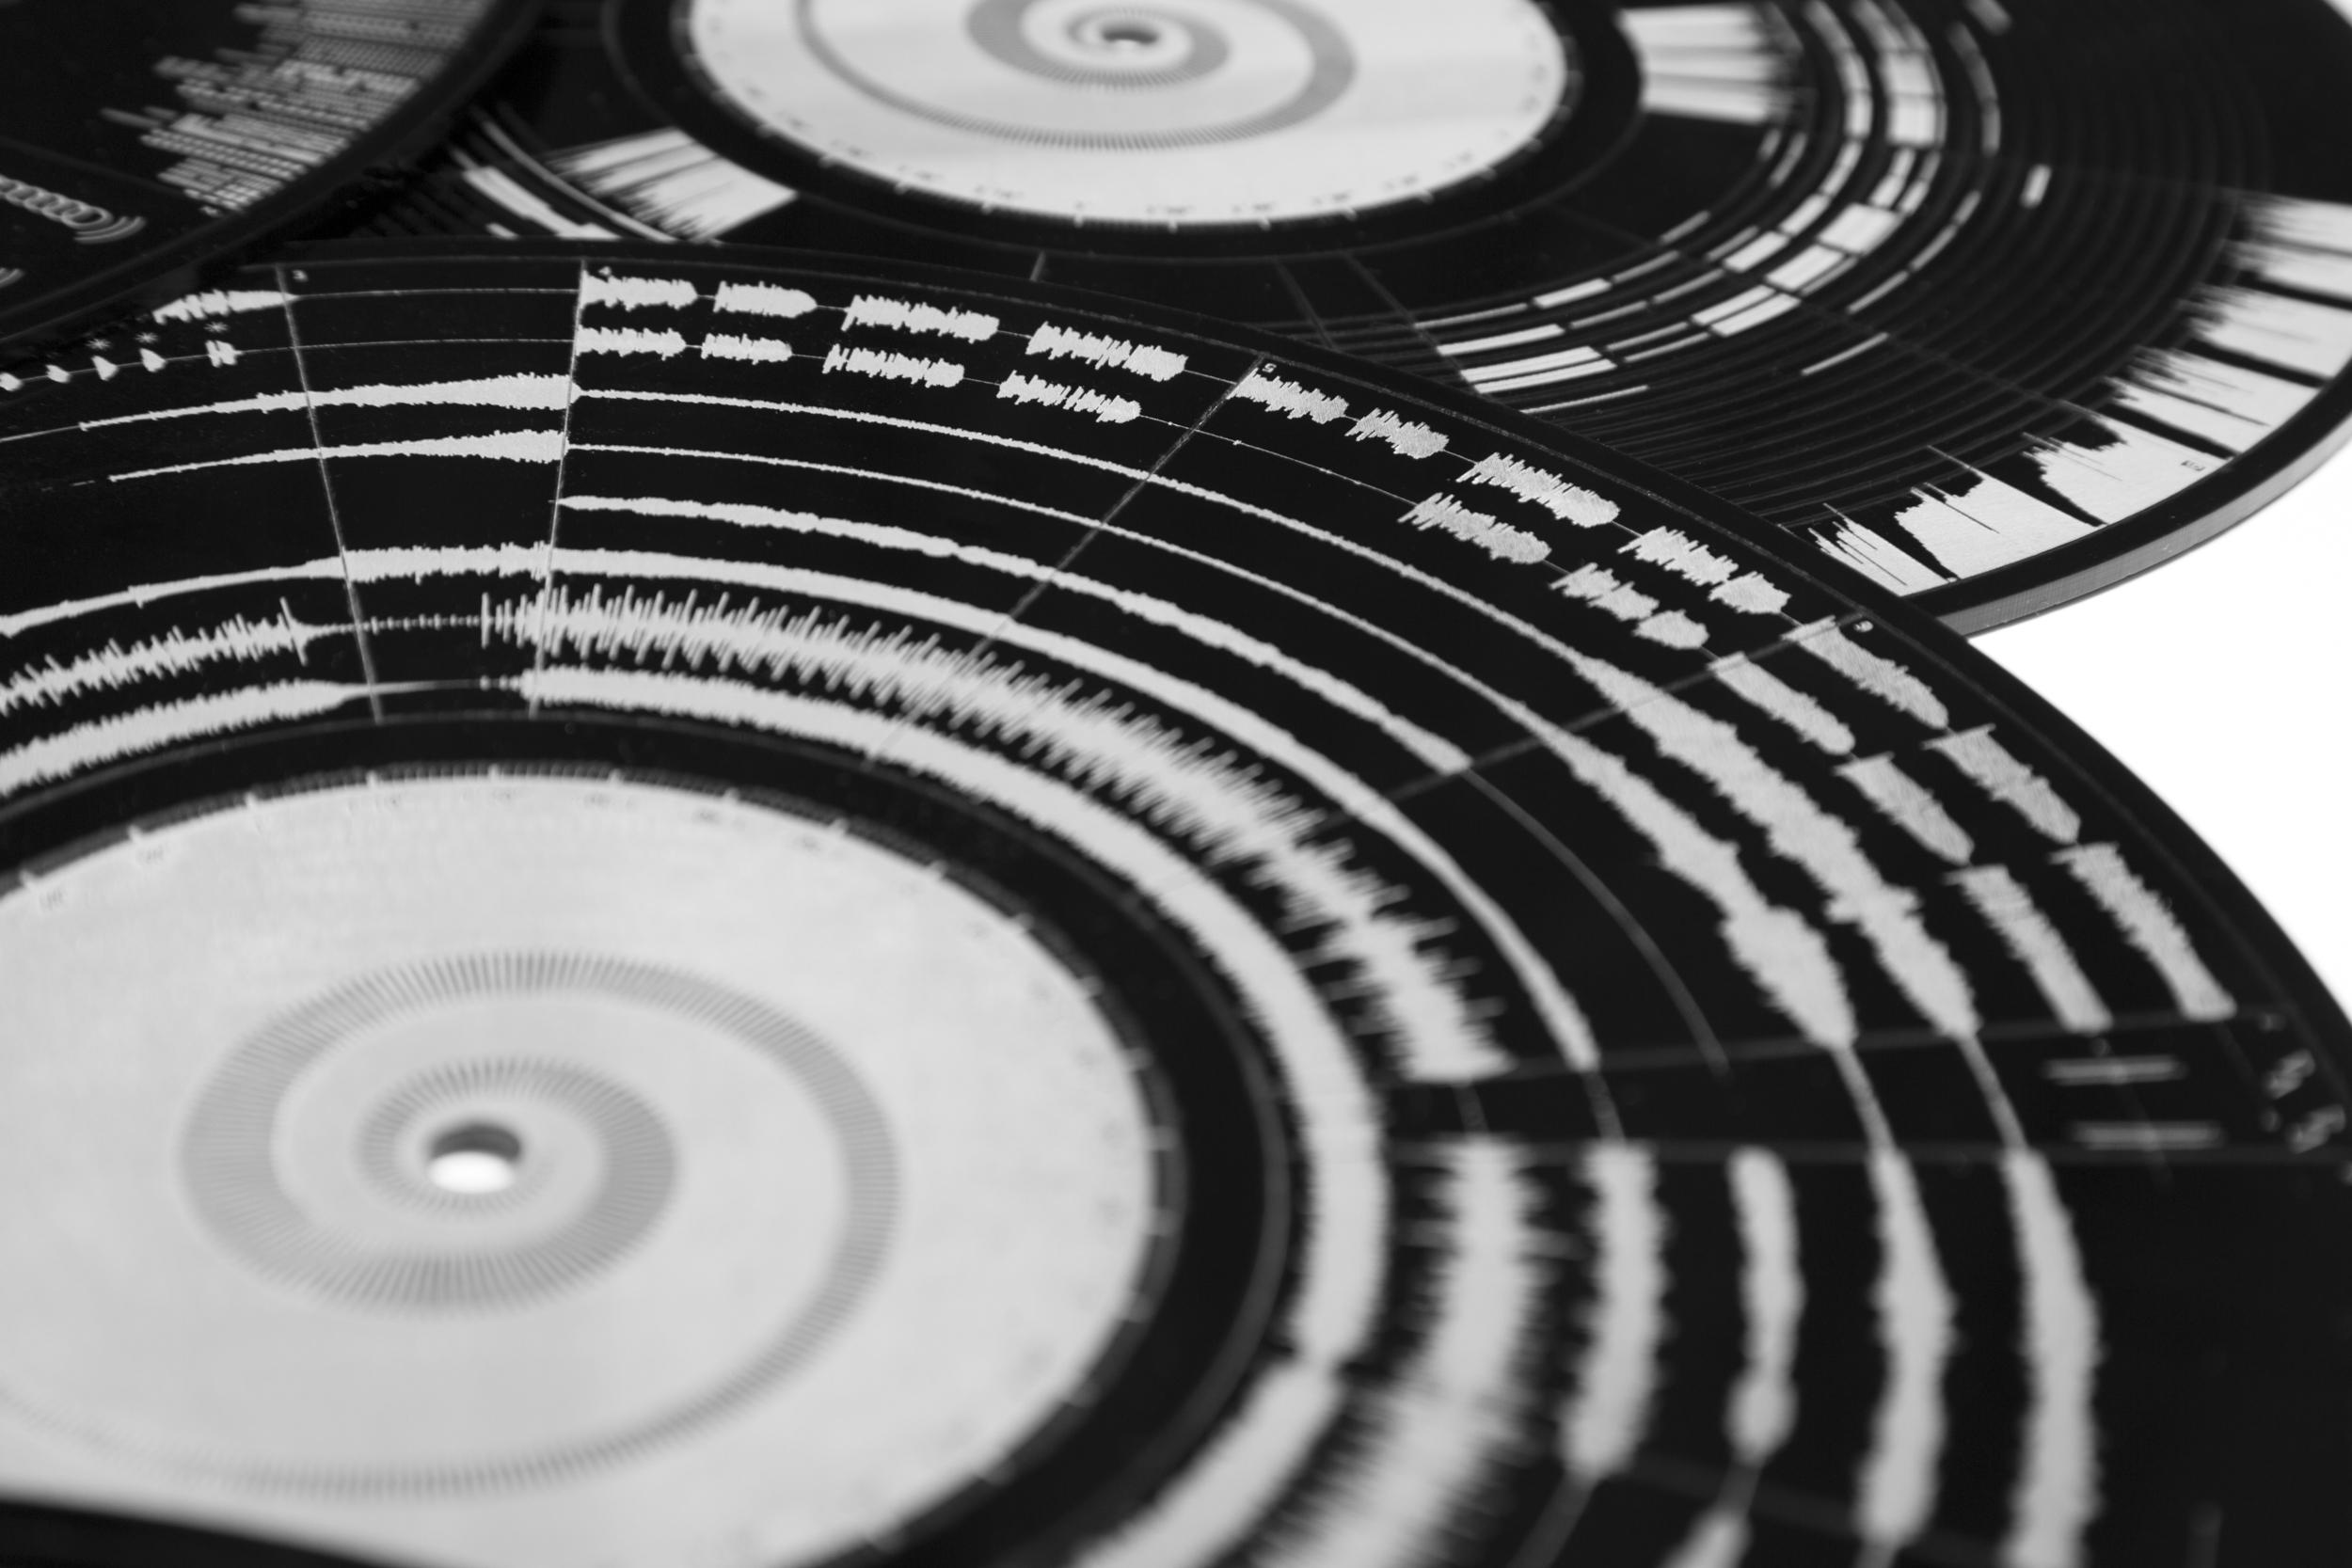 ODDITYVIZ_Records_Closeups--5.jpg